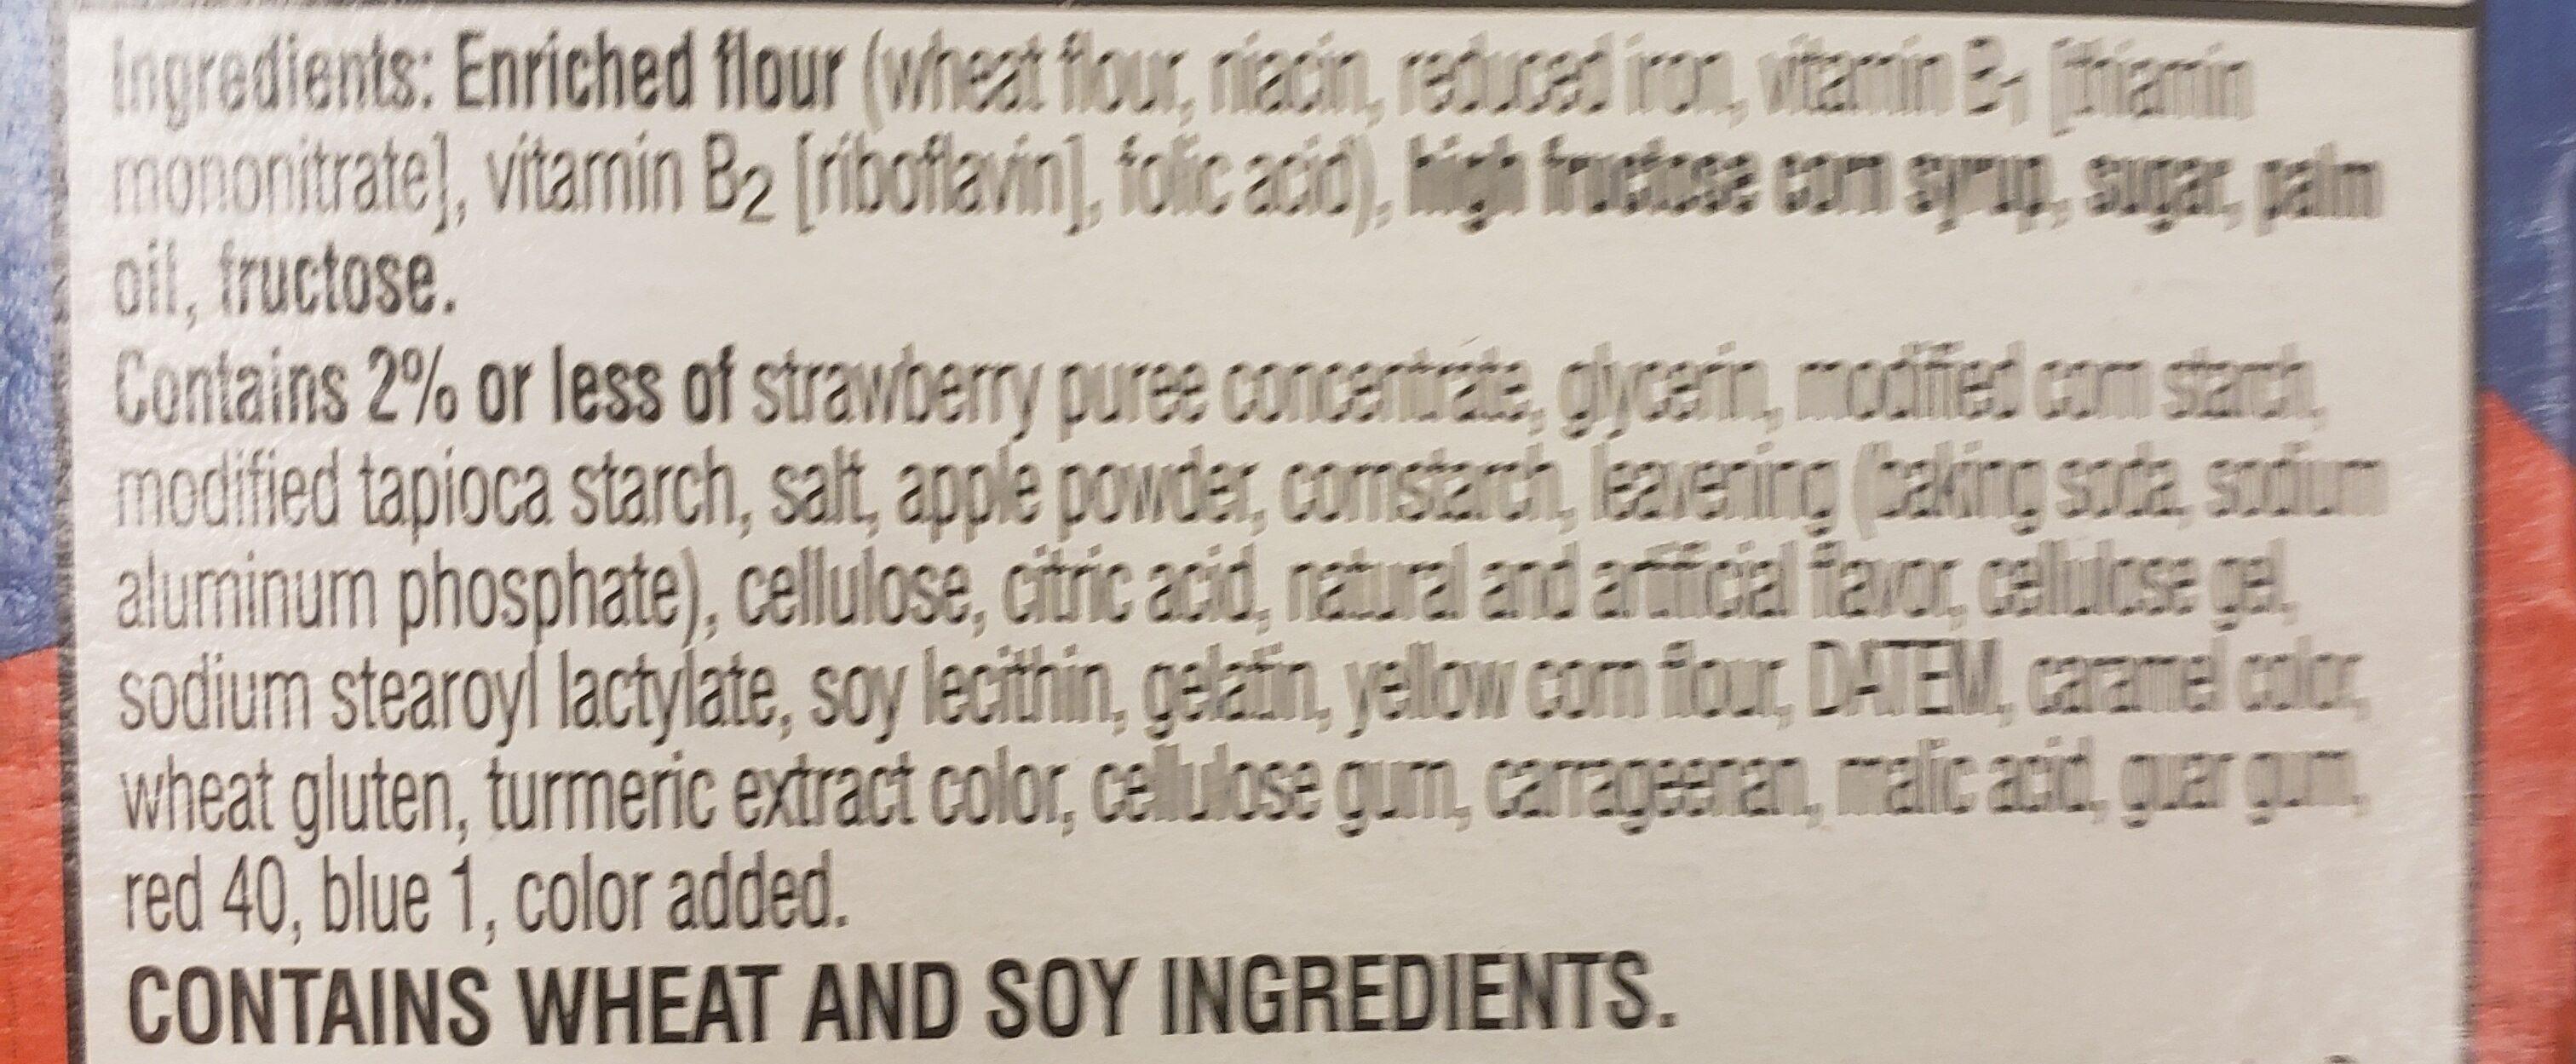 pop tarts bites - Ingredients